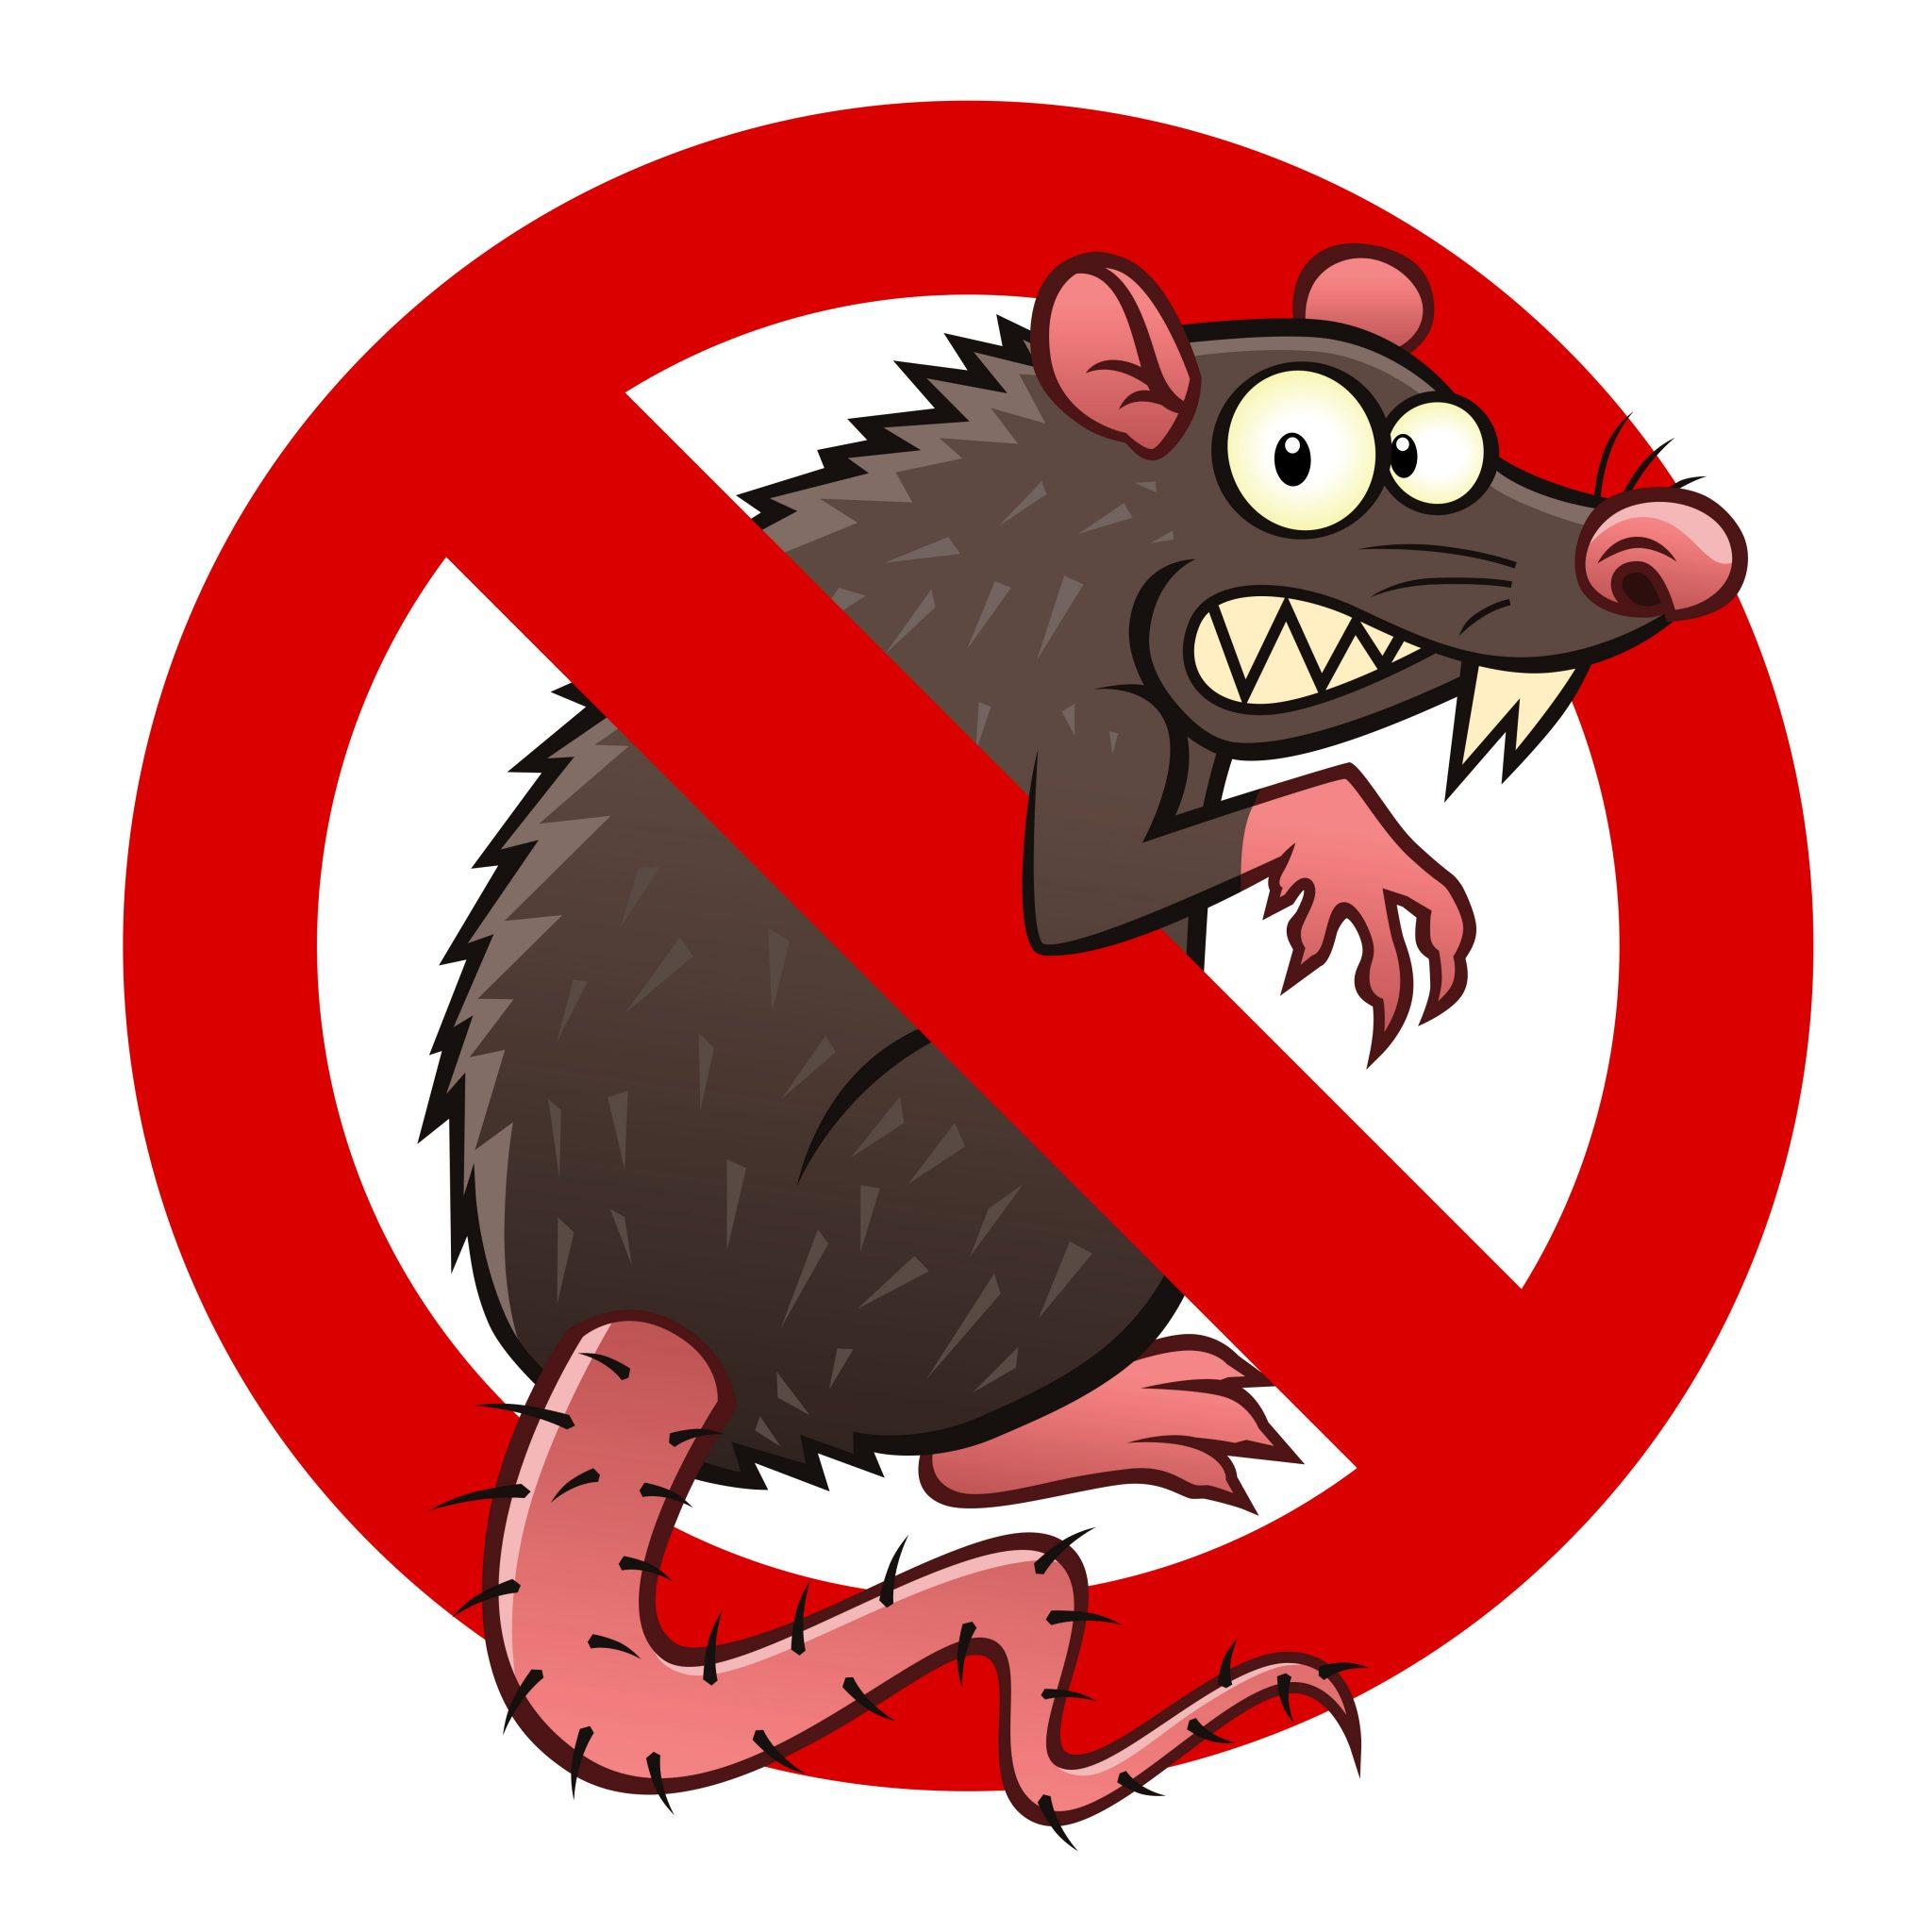 serial-killer-or-cereal-eater-the-rat-dilemma